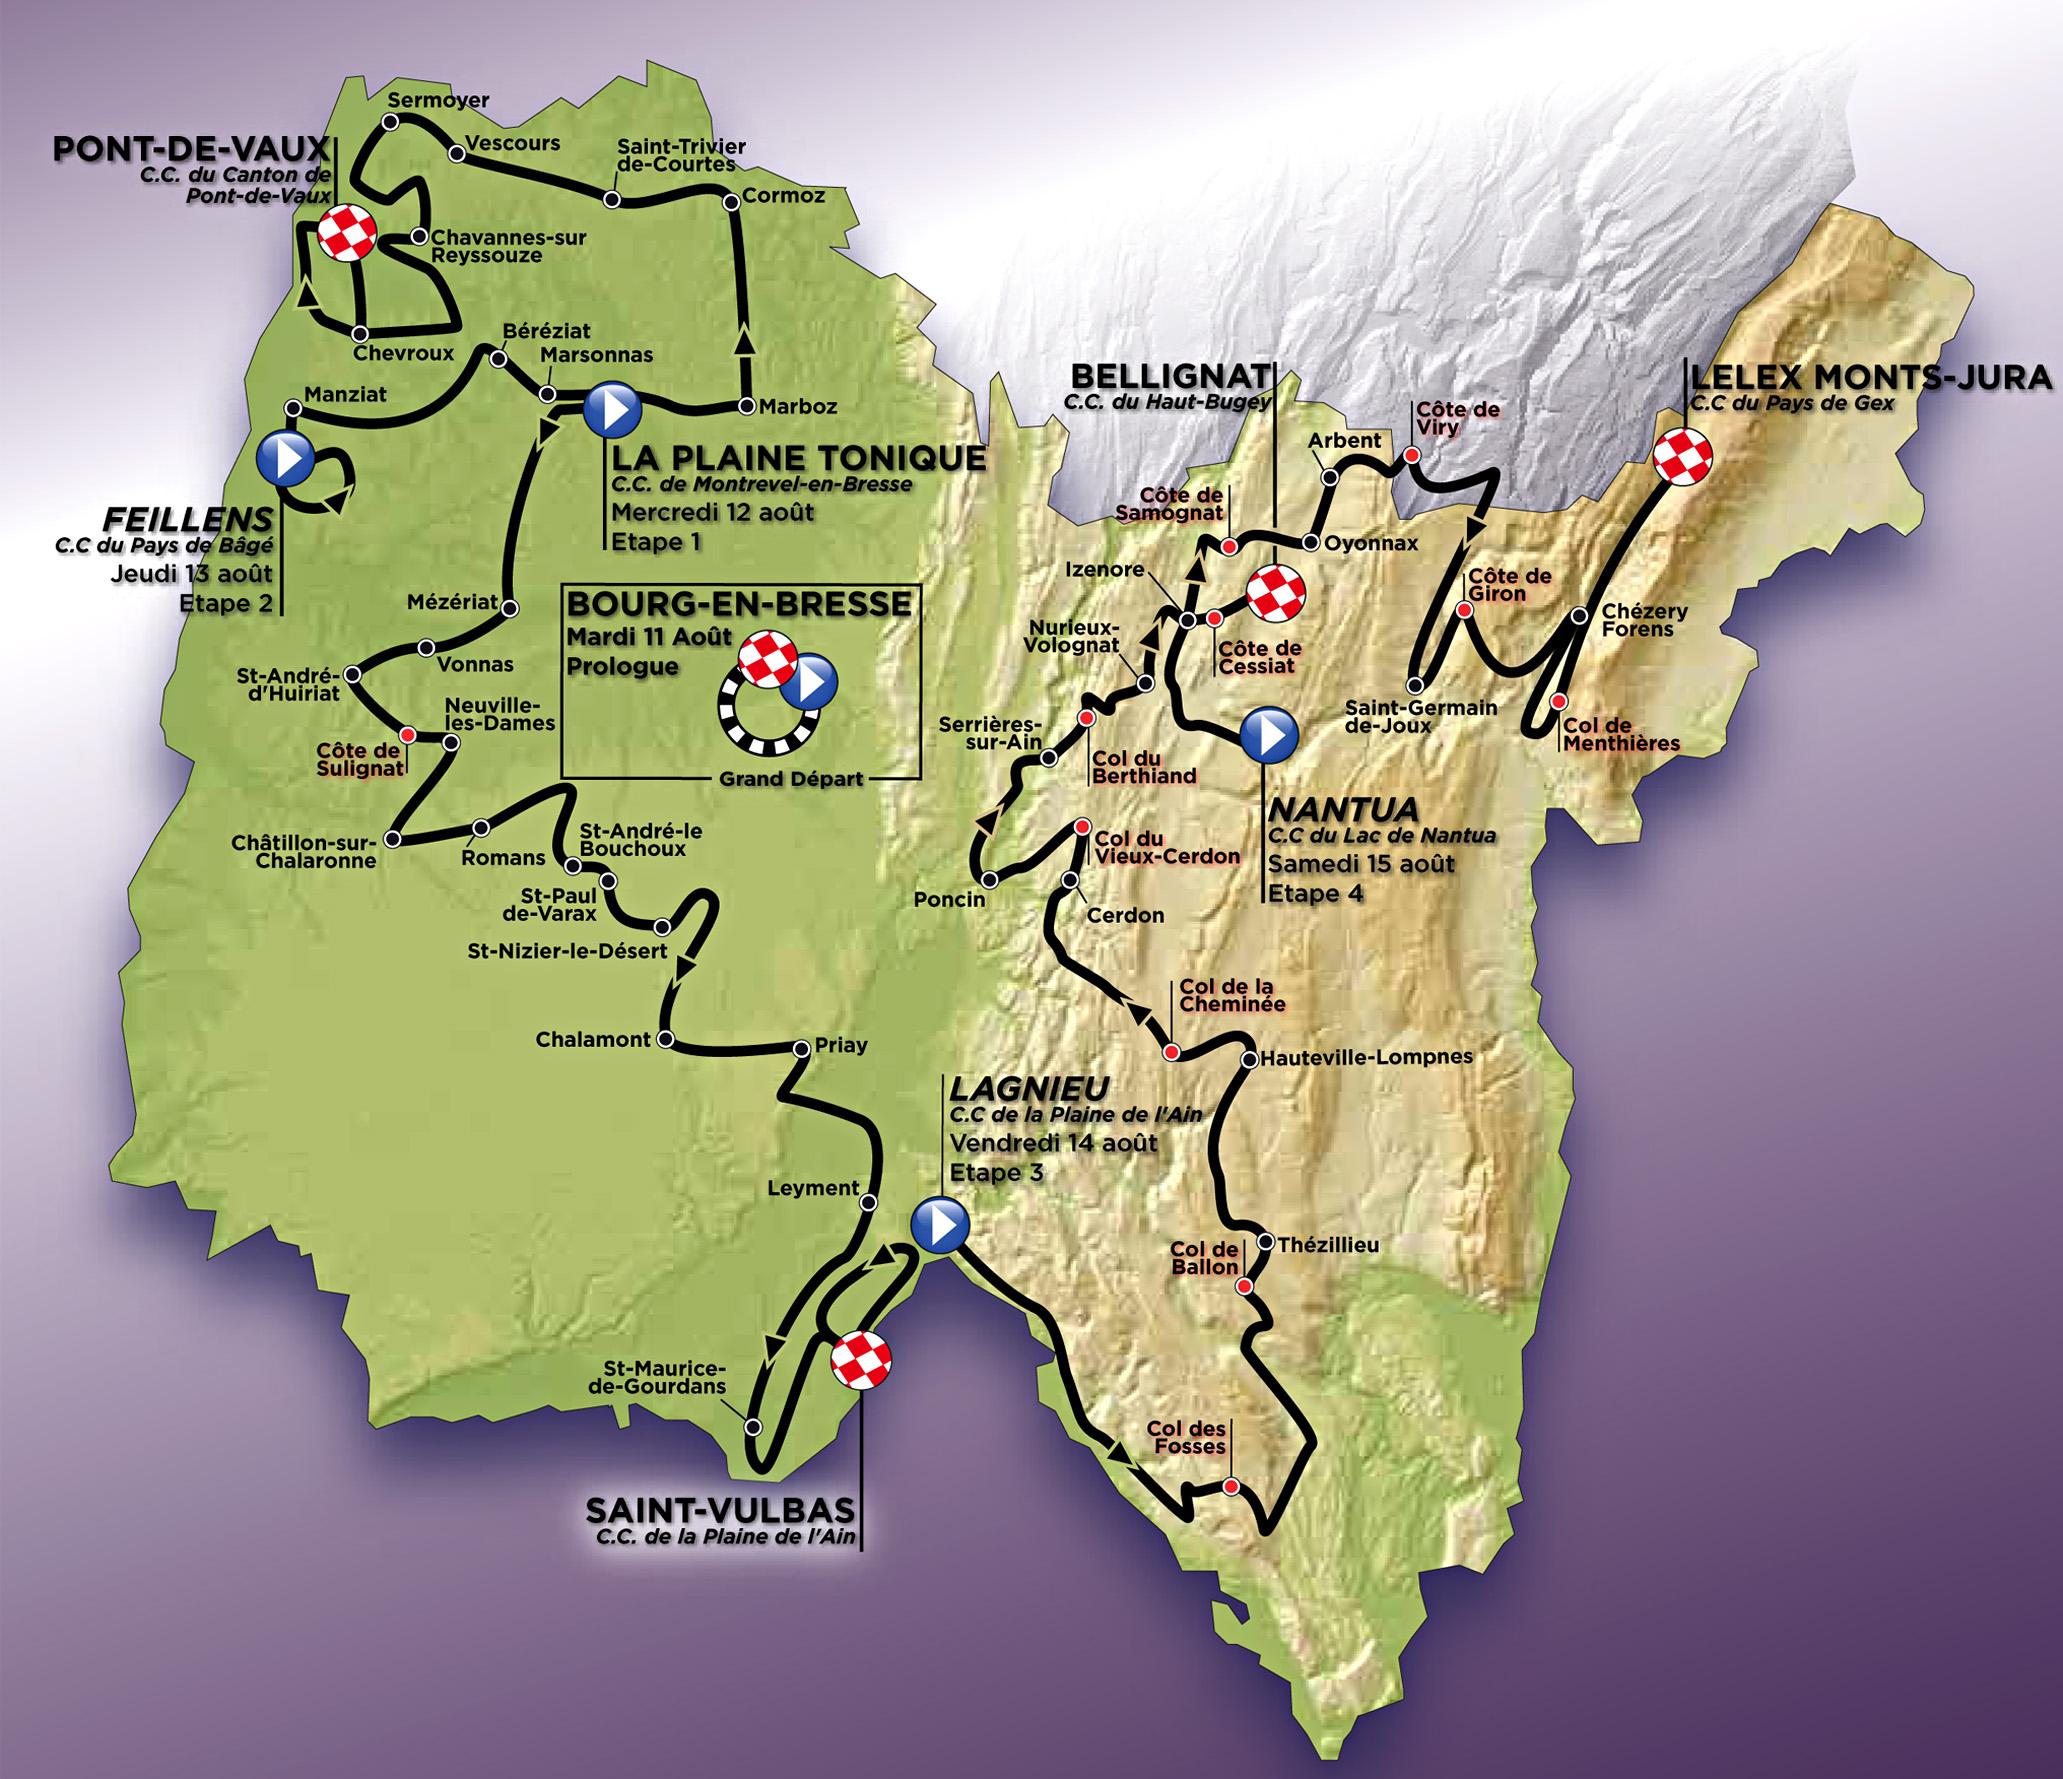 Маршрут многодневной велогонки - Тур де Лан 2015